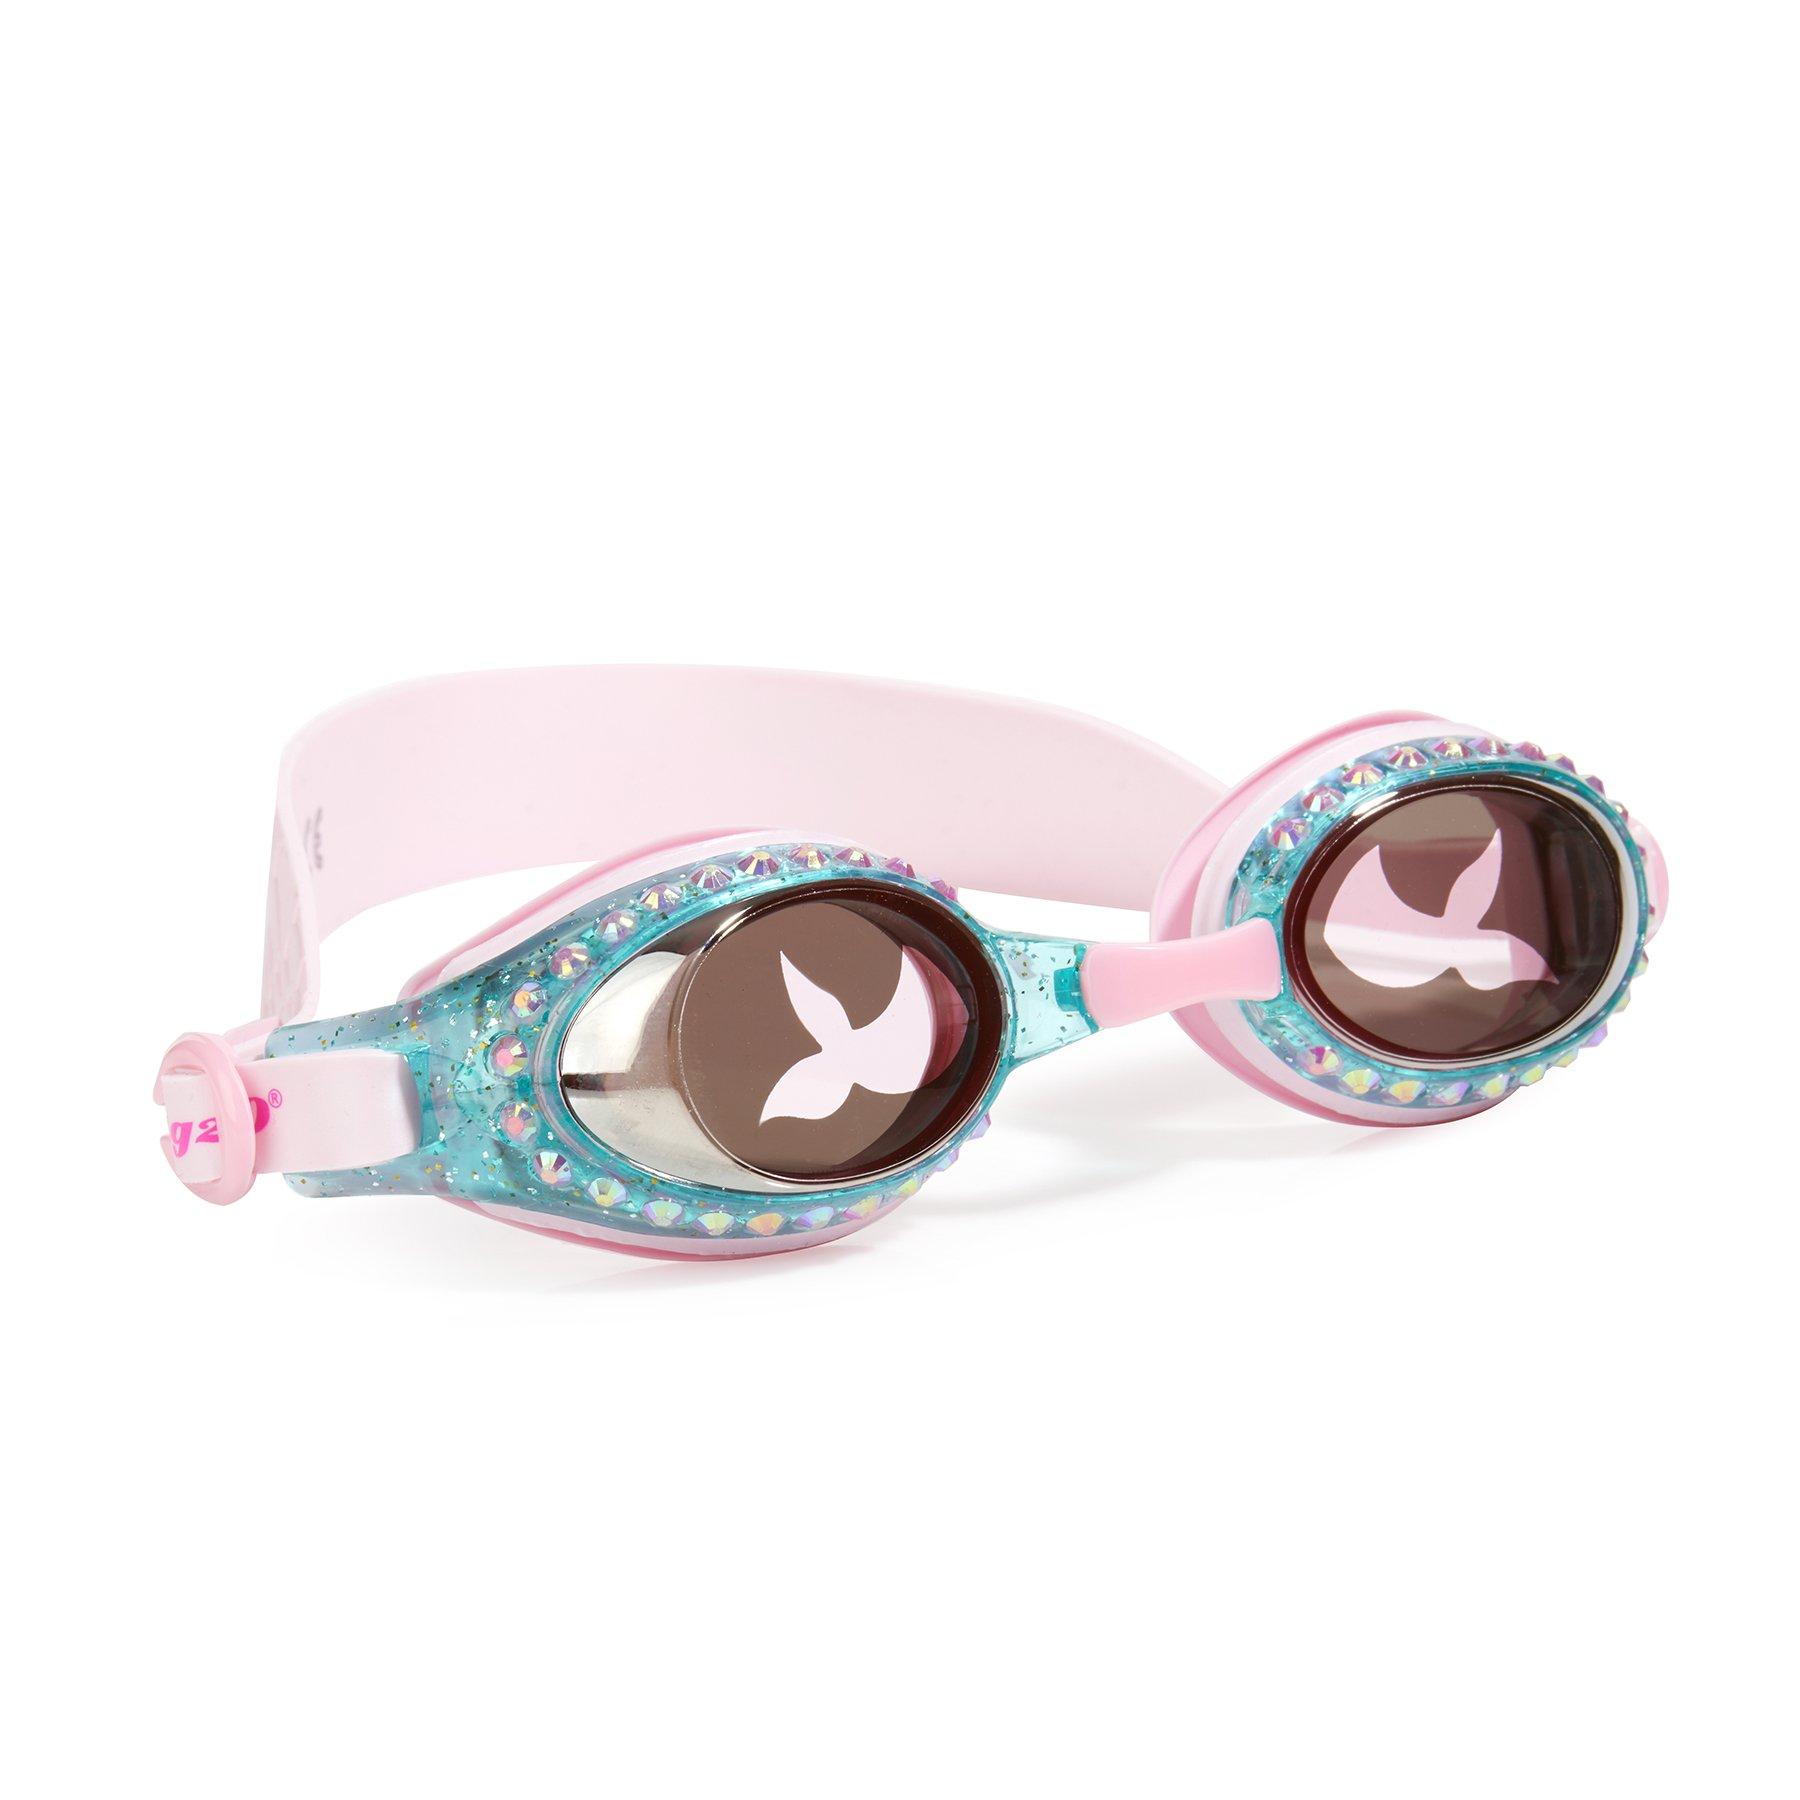 Bling 2o Swimming Goggles Mermaid Jewel